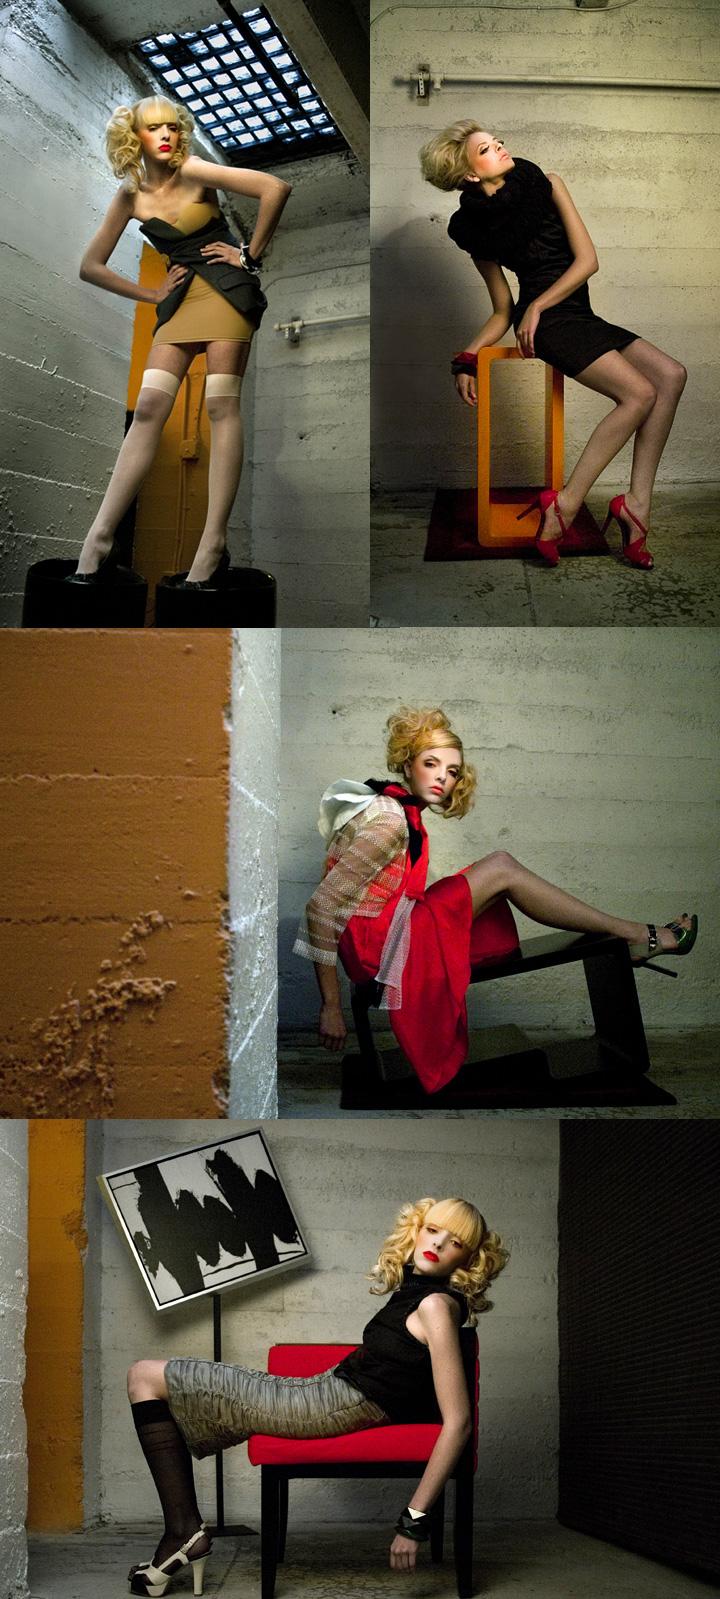 City Furniture, Seattle, WA Aug 27, 2008 All rights reserved 2008 Modern Basement: Amanda w/Mode Models